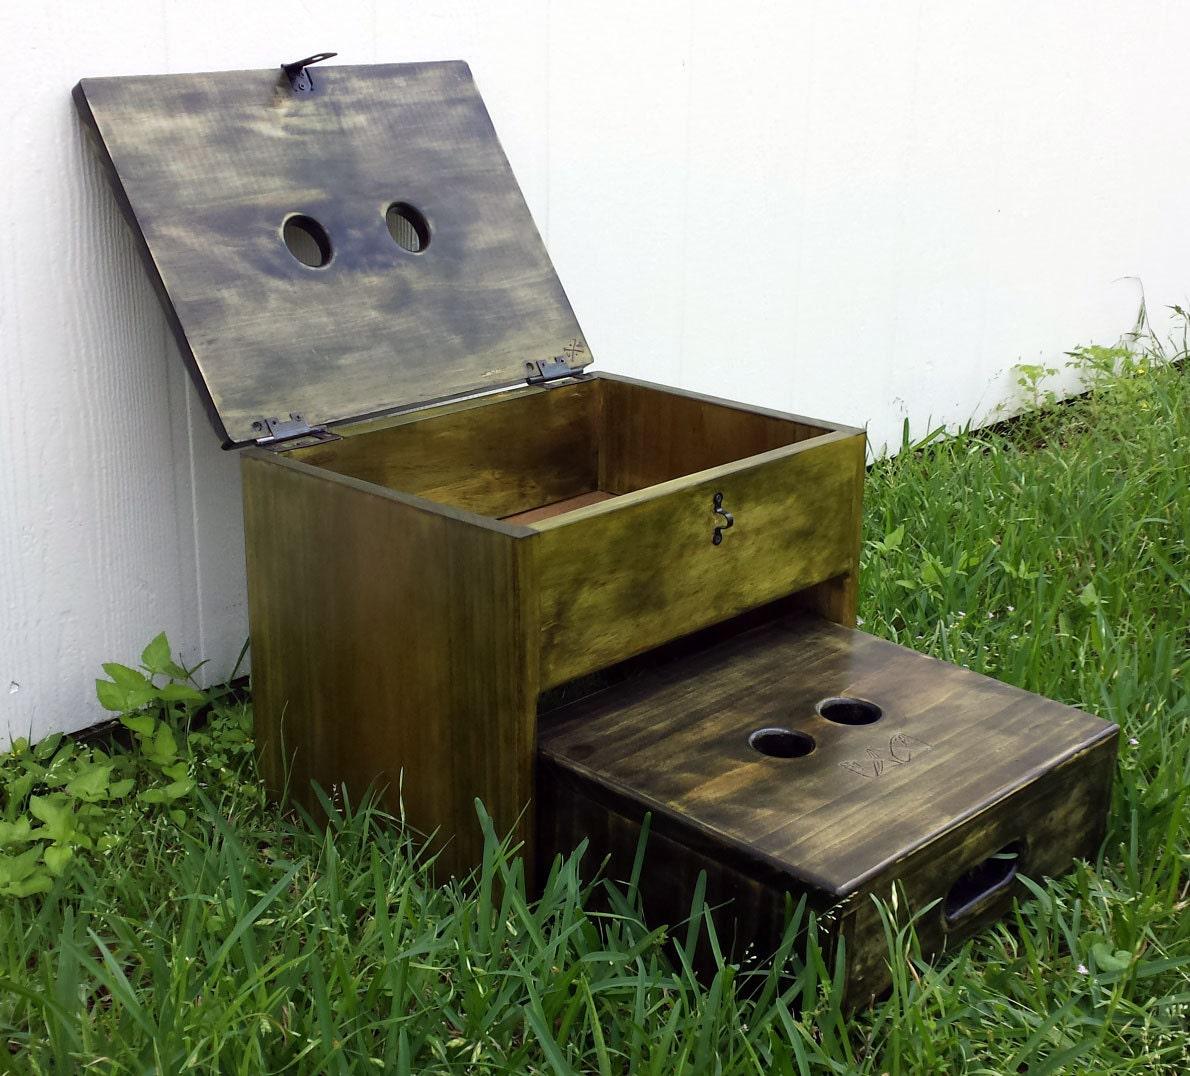 step stool storage box rustic celtic art nouveau etsy. Black Bedroom Furniture Sets. Home Design Ideas